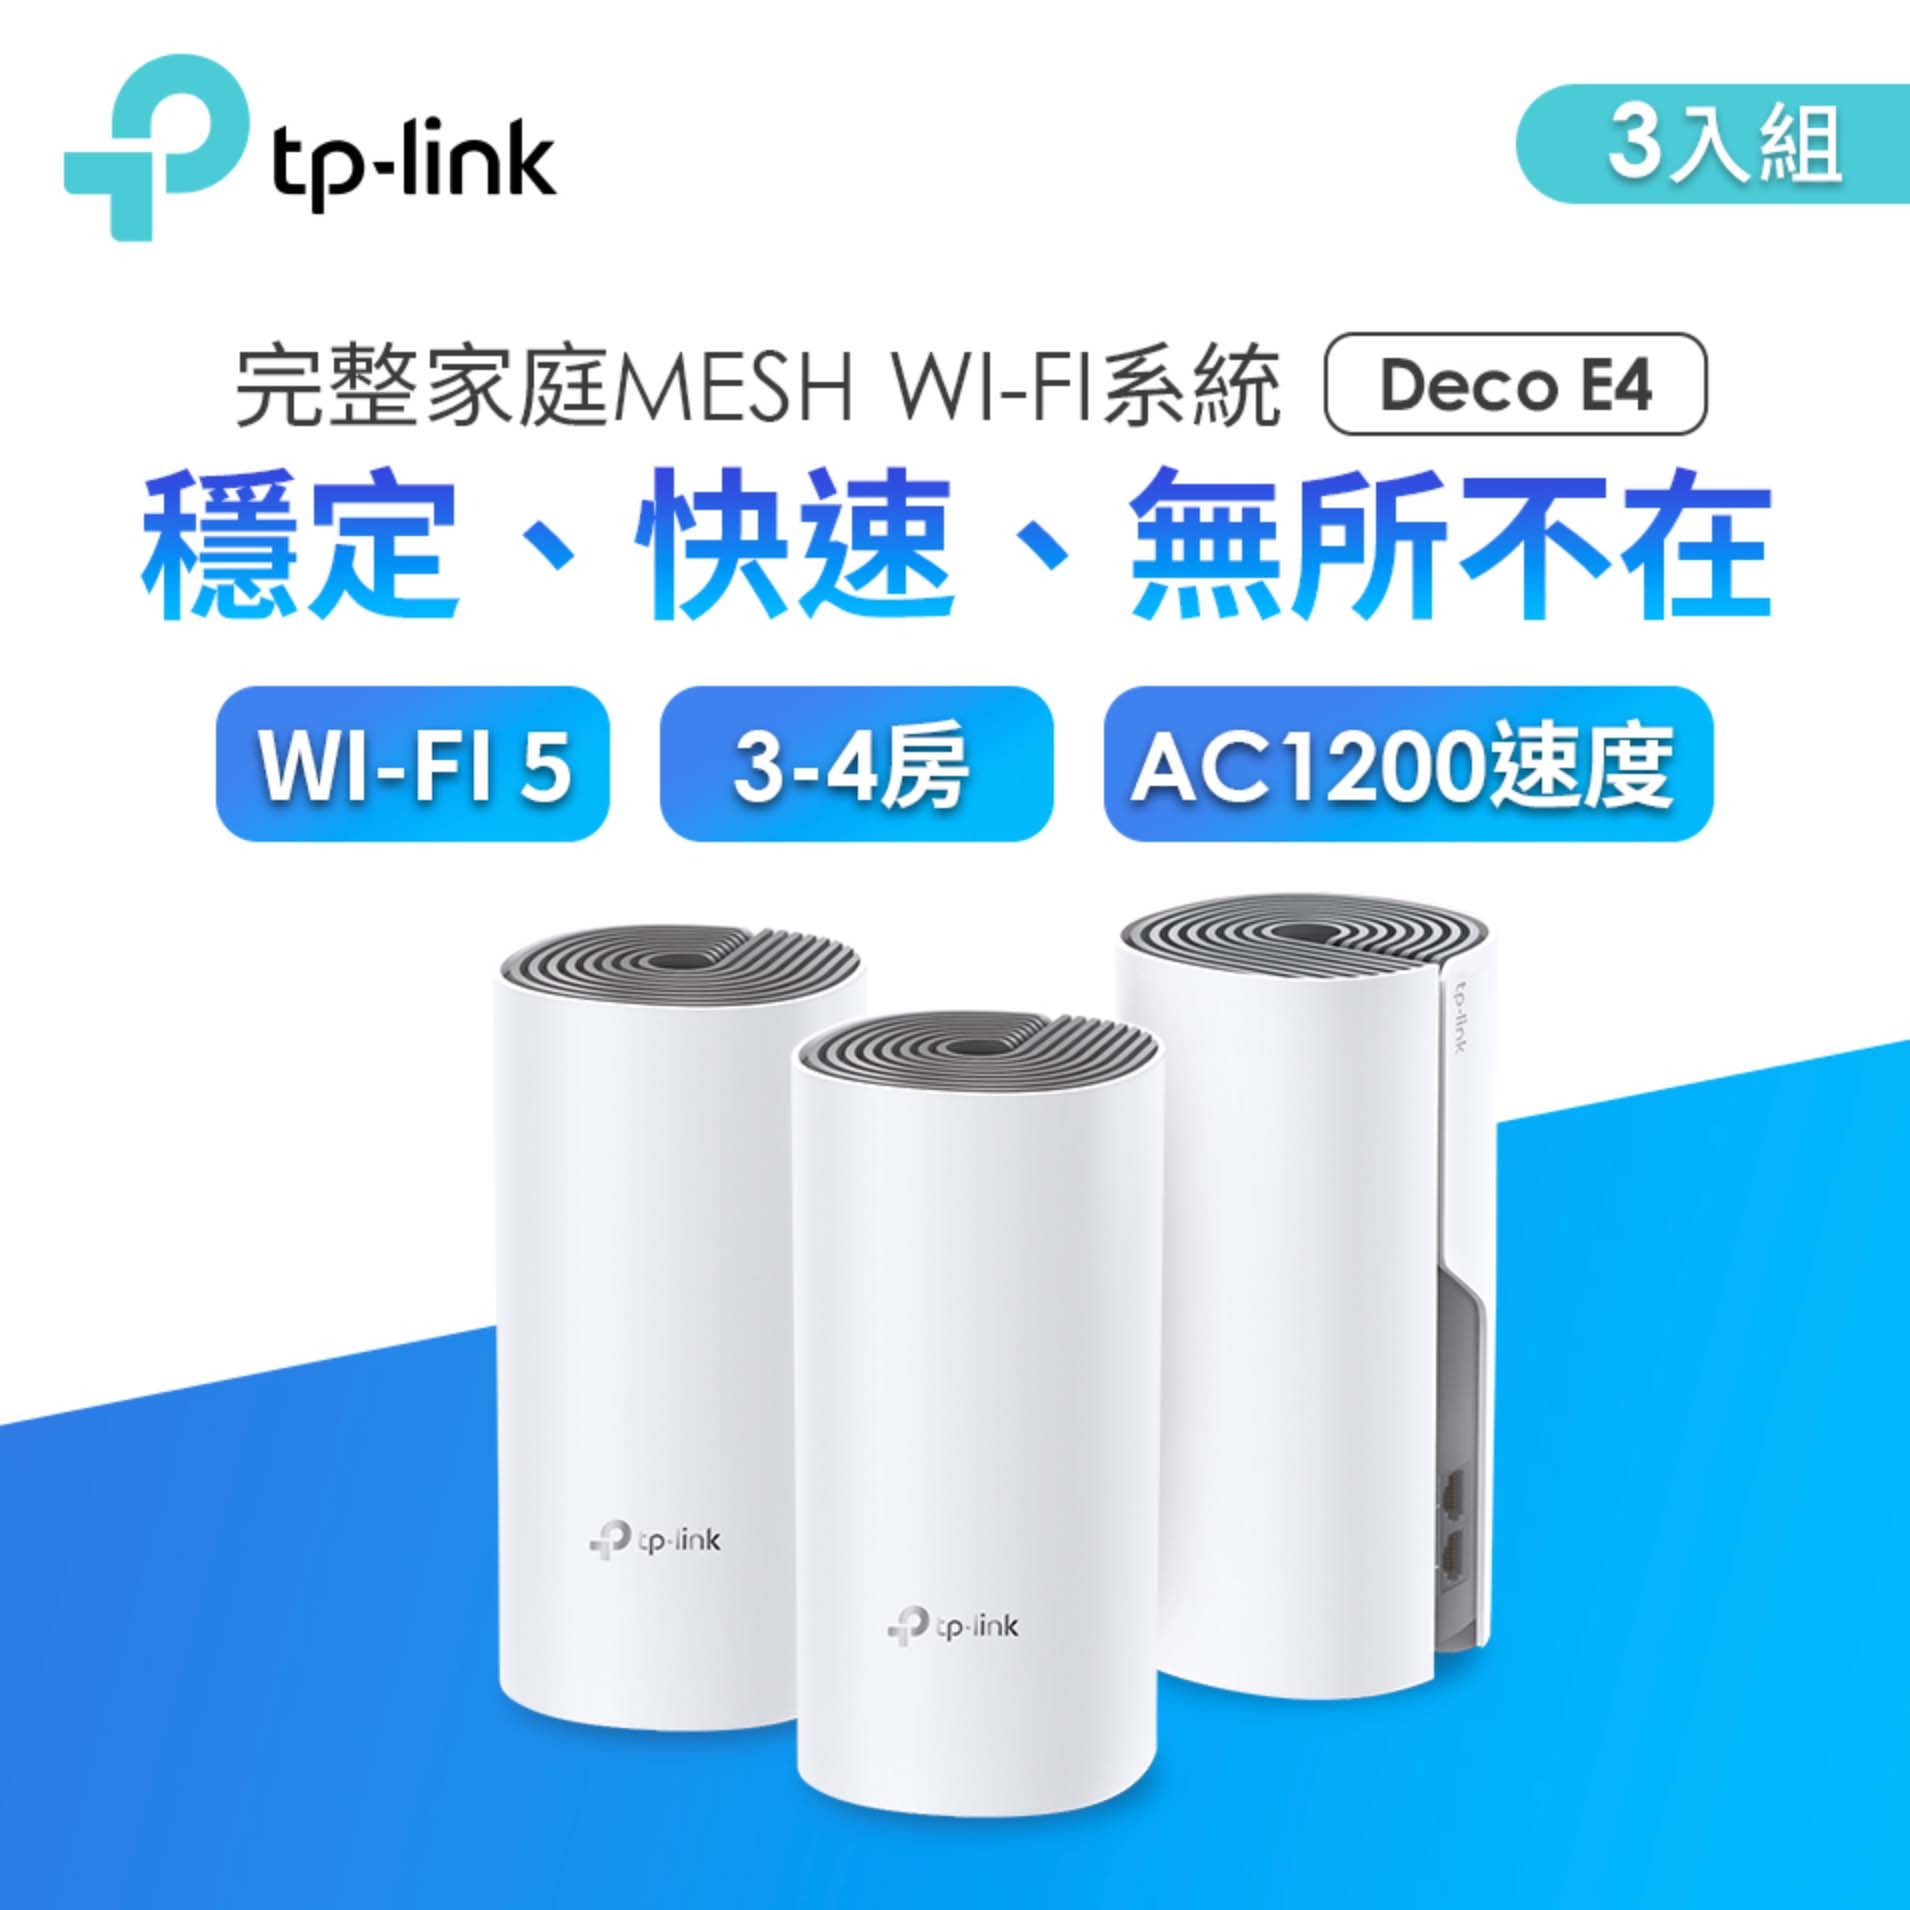 TP-LINK Deco E4智慧家庭Wi-Fi系統